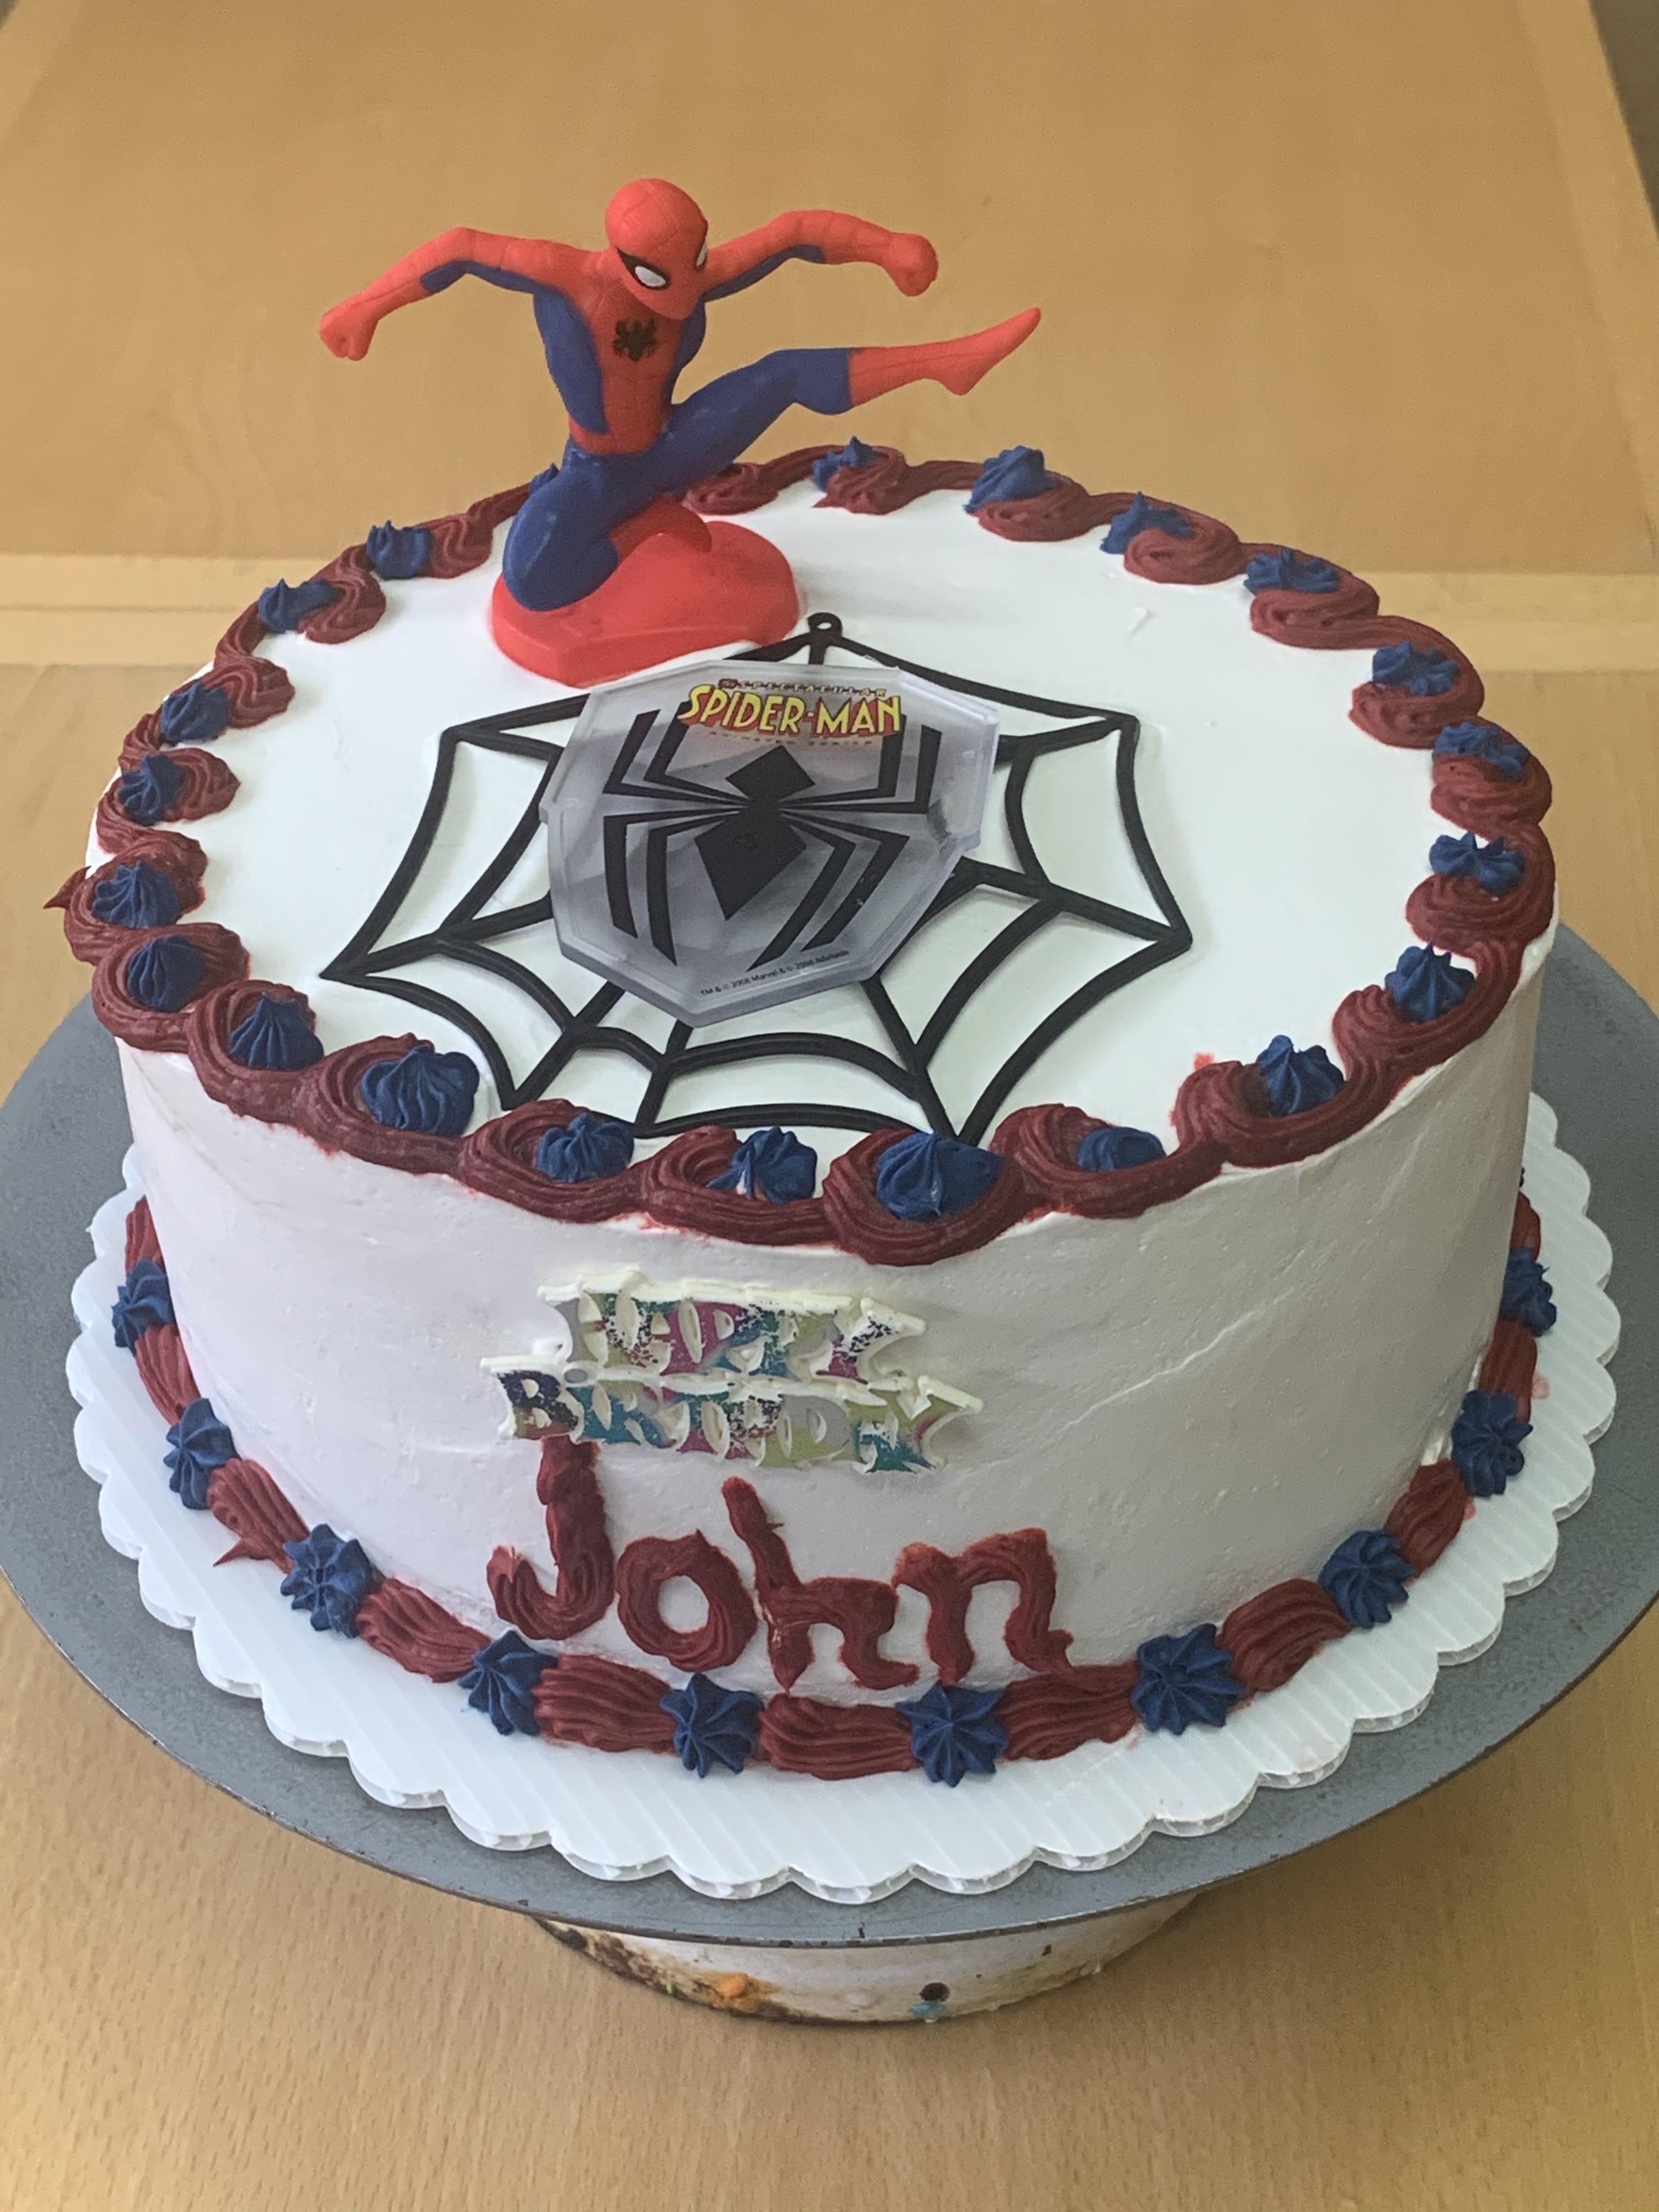 Wondrous Spider Man Boys Birthday Cake Wild Berries Bakery And Cafe Funny Birthday Cards Online Barepcheapnameinfo